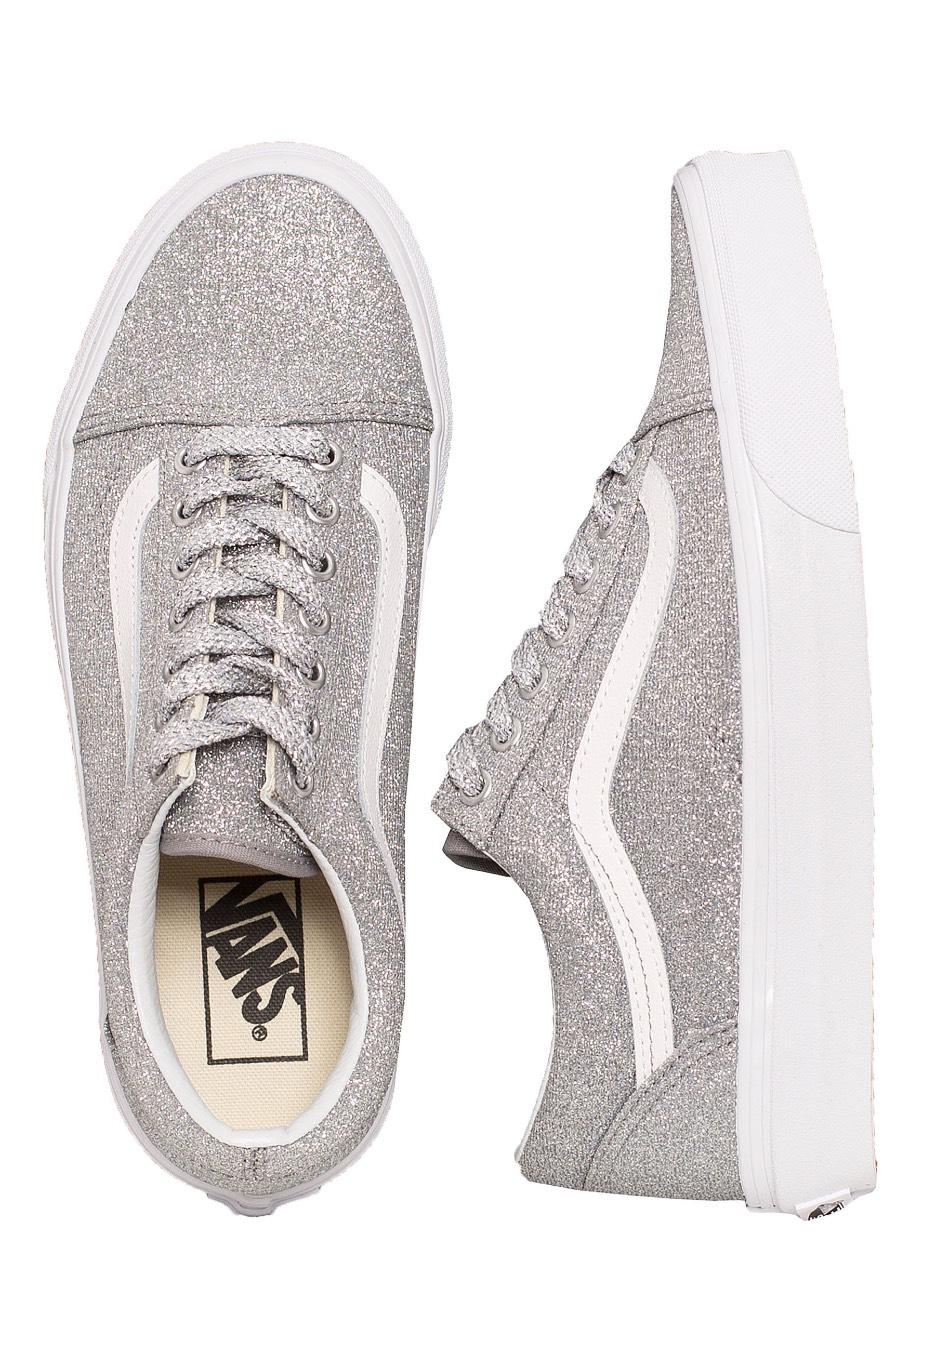 Vans - Old Skool Lurex Glitter Silver True White - Girl Shoes -  Impericon.com UK 93339d701